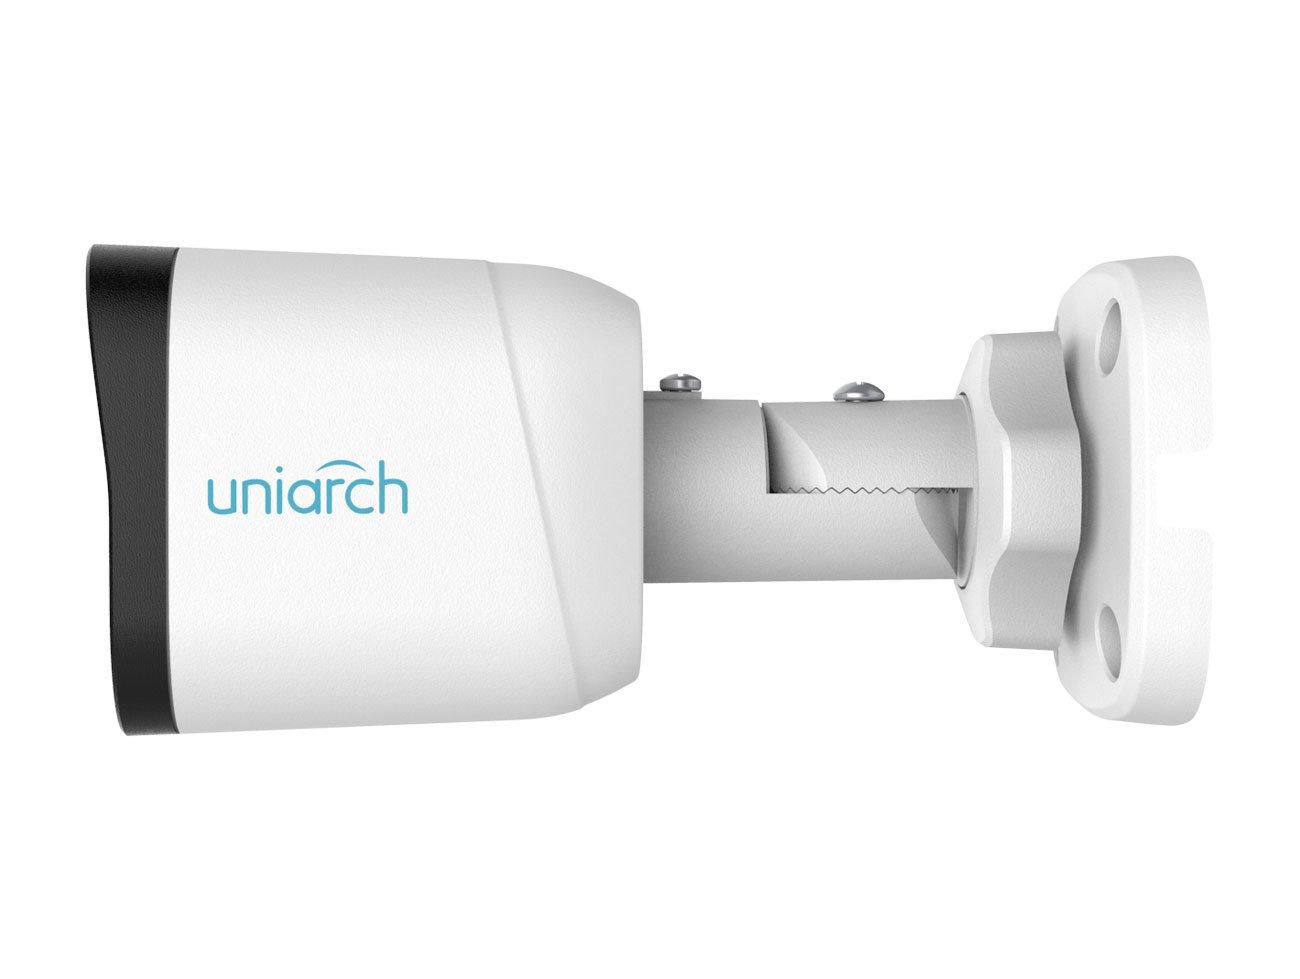 Telecamera-Uniarch-Ip-Bullet-2